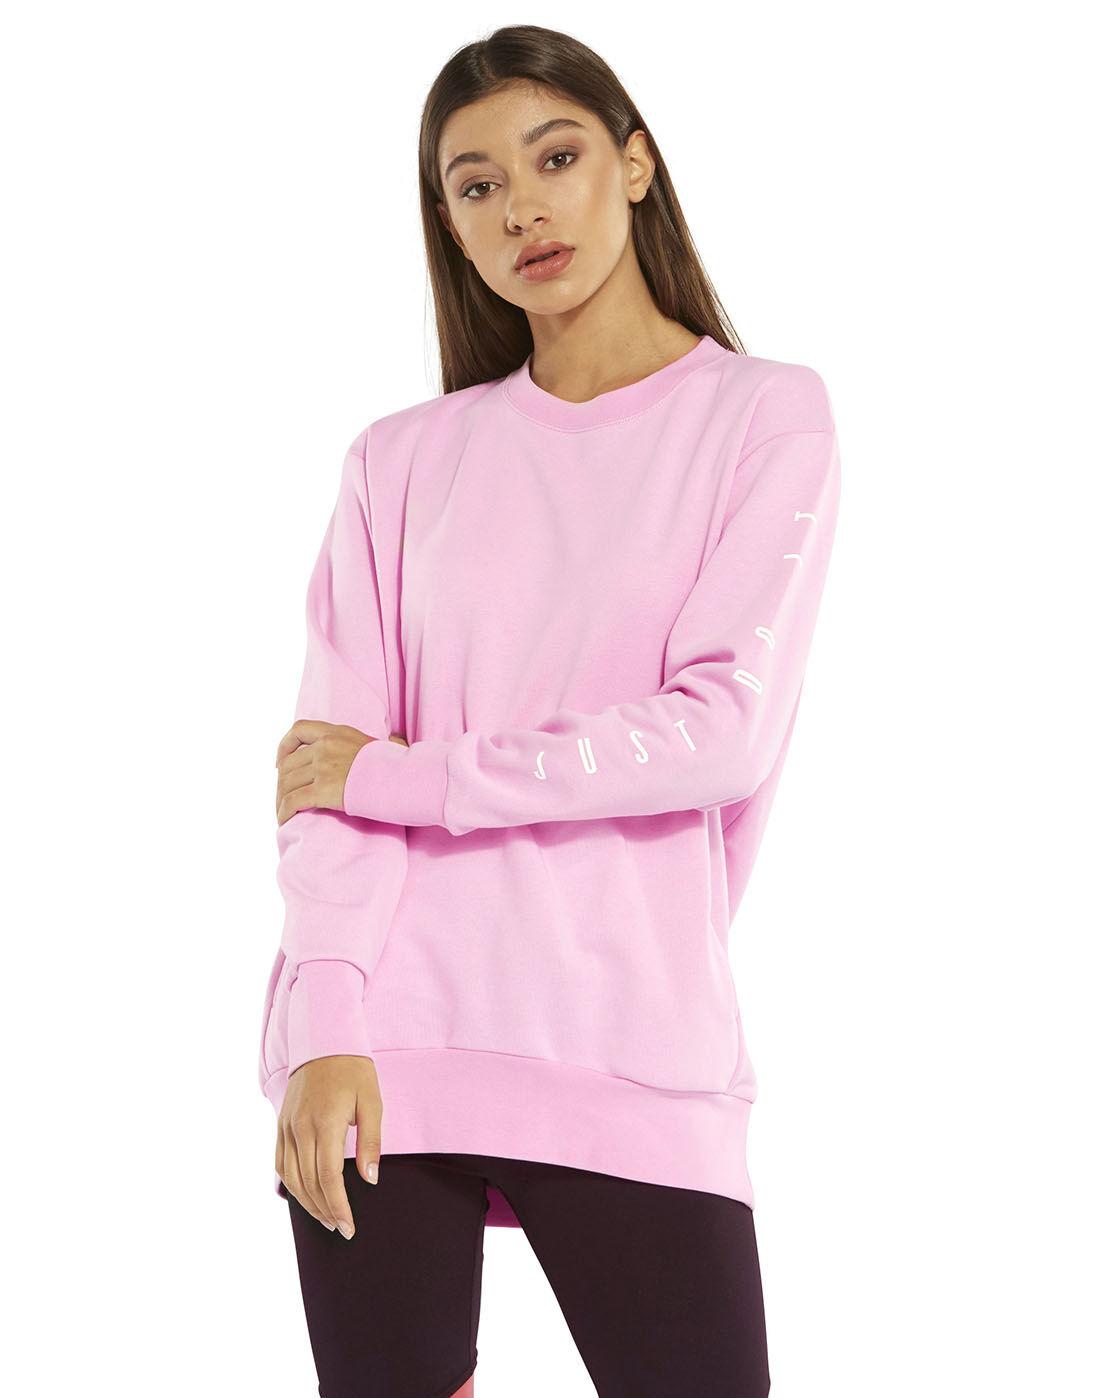 Women's Pink Nike Dry Sweatshirt   Life